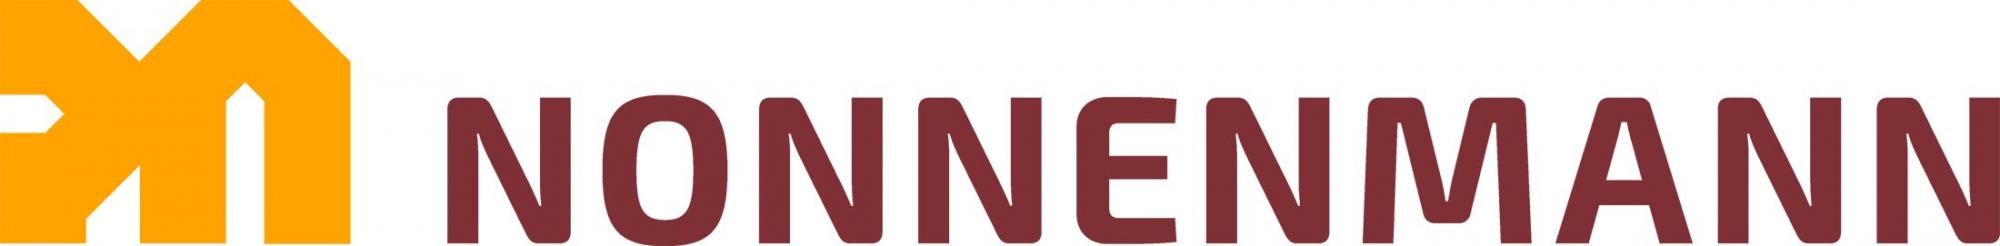 Nonnenmann Logo